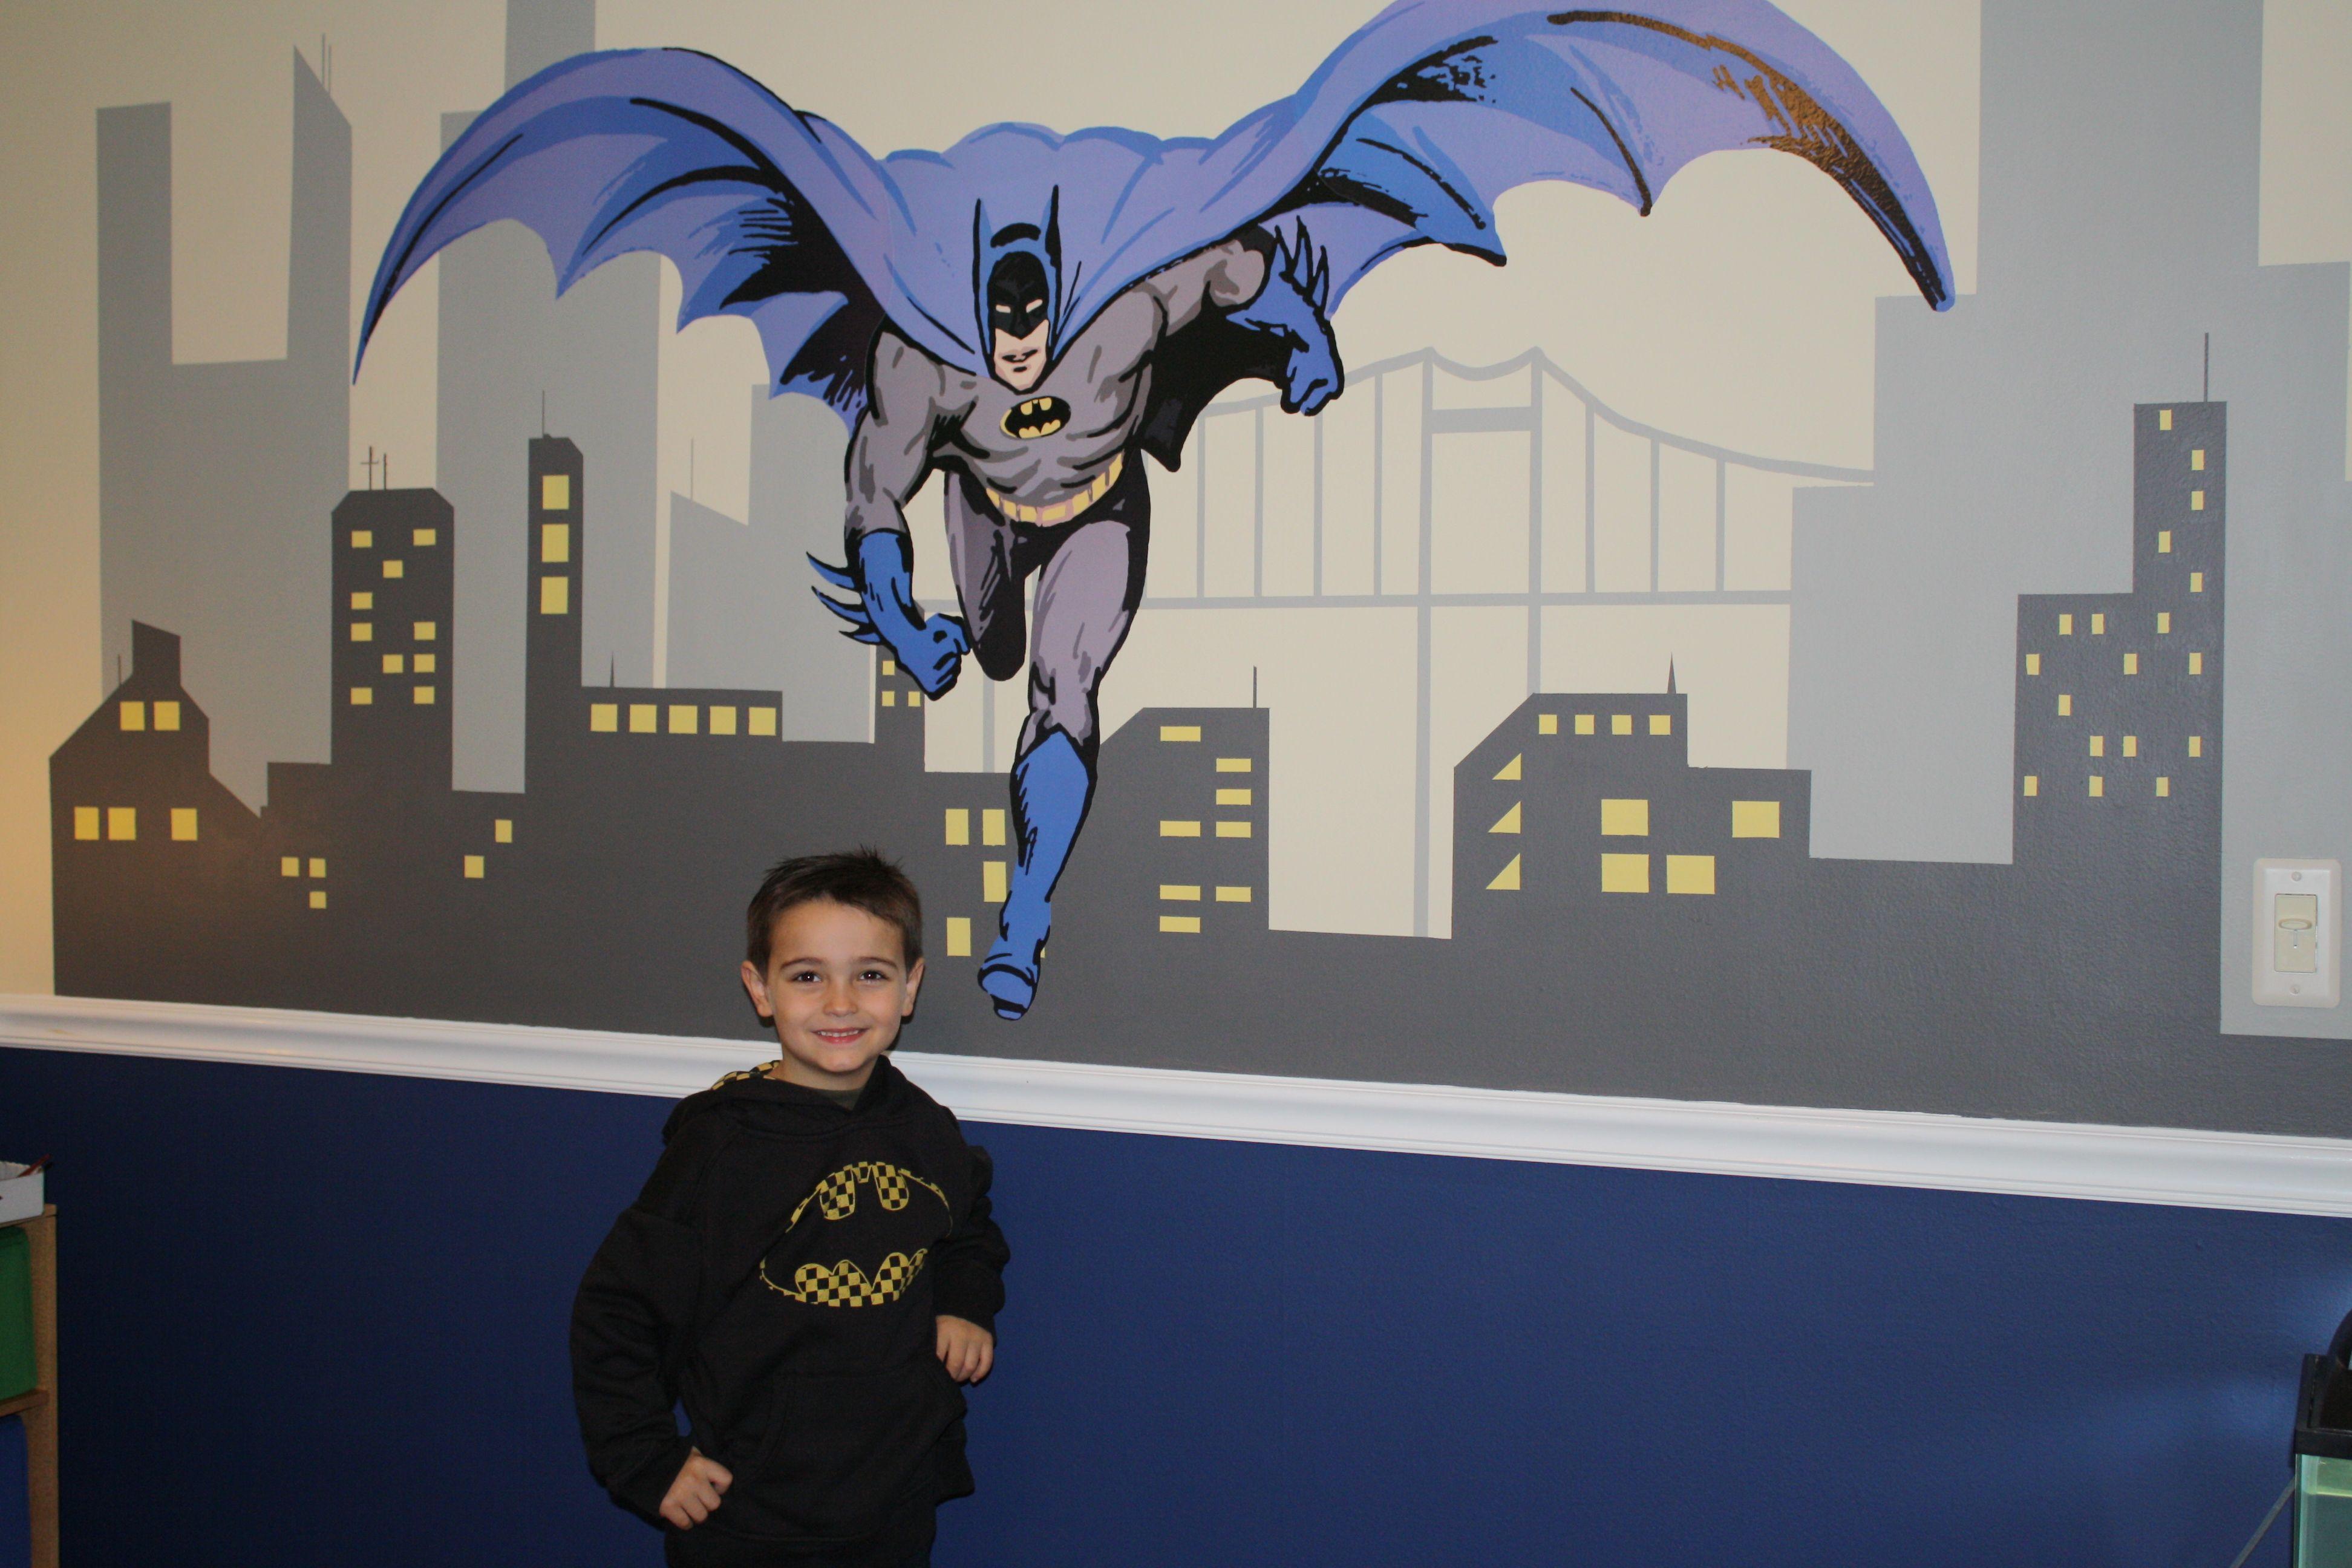 Paint Colors Blue Gray And Black Batman Room Ideas